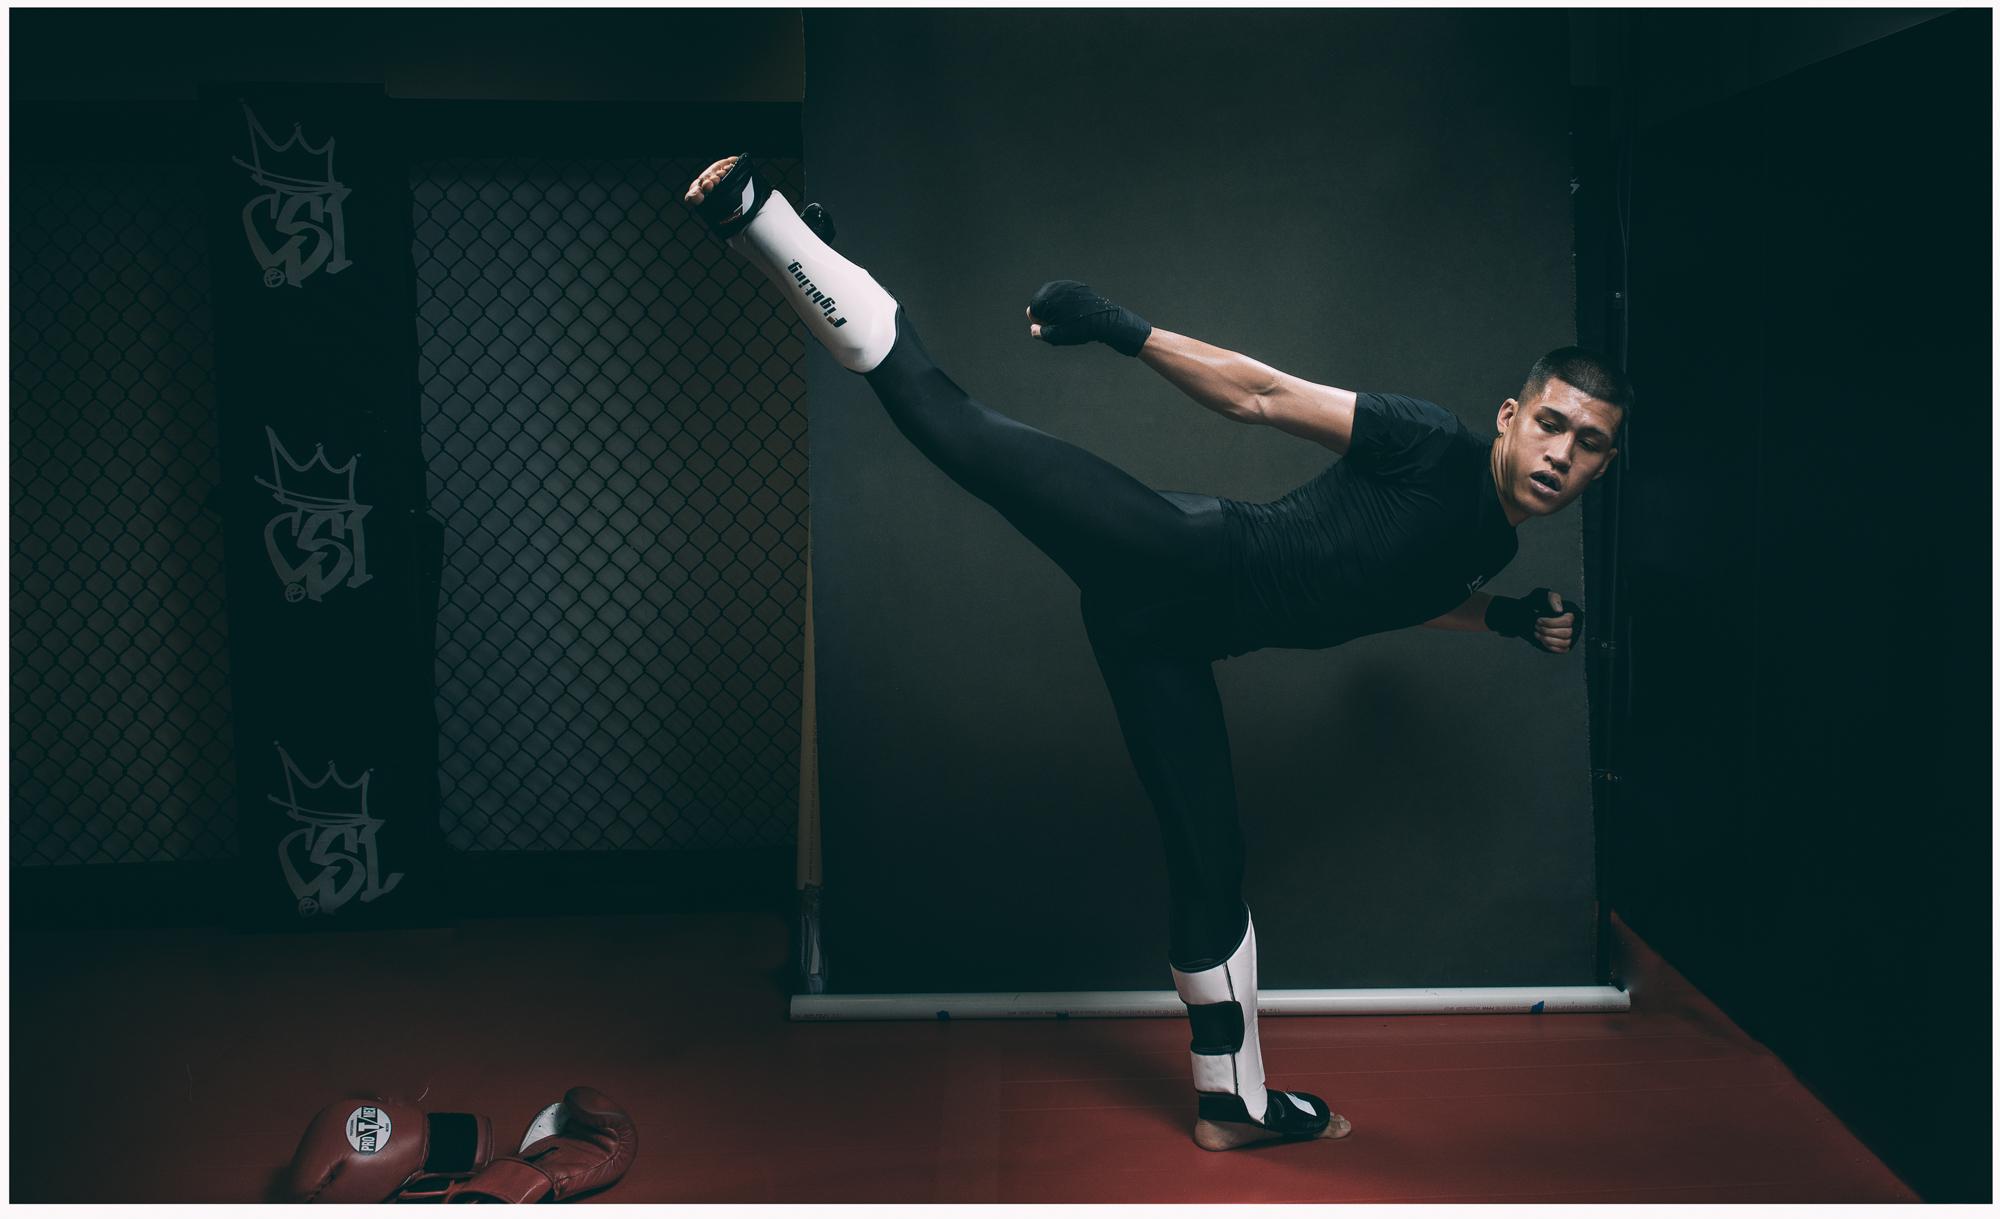 Andy_Genesis_MMA_Fighters_Justin_Lister-8356-Edit.jpg